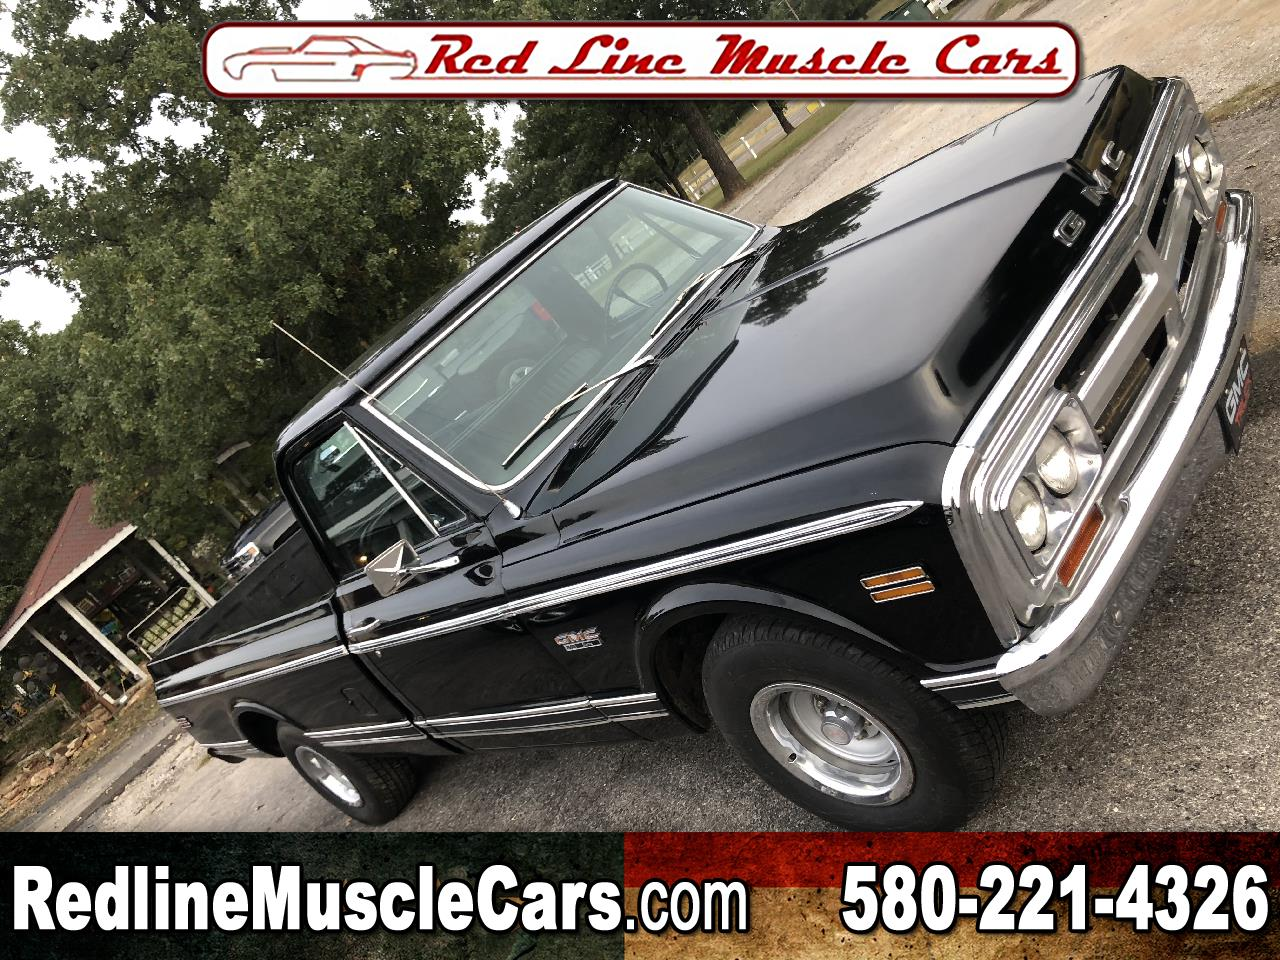 1972 GMC Sierra 1500 Classic SL Long Box 2WD